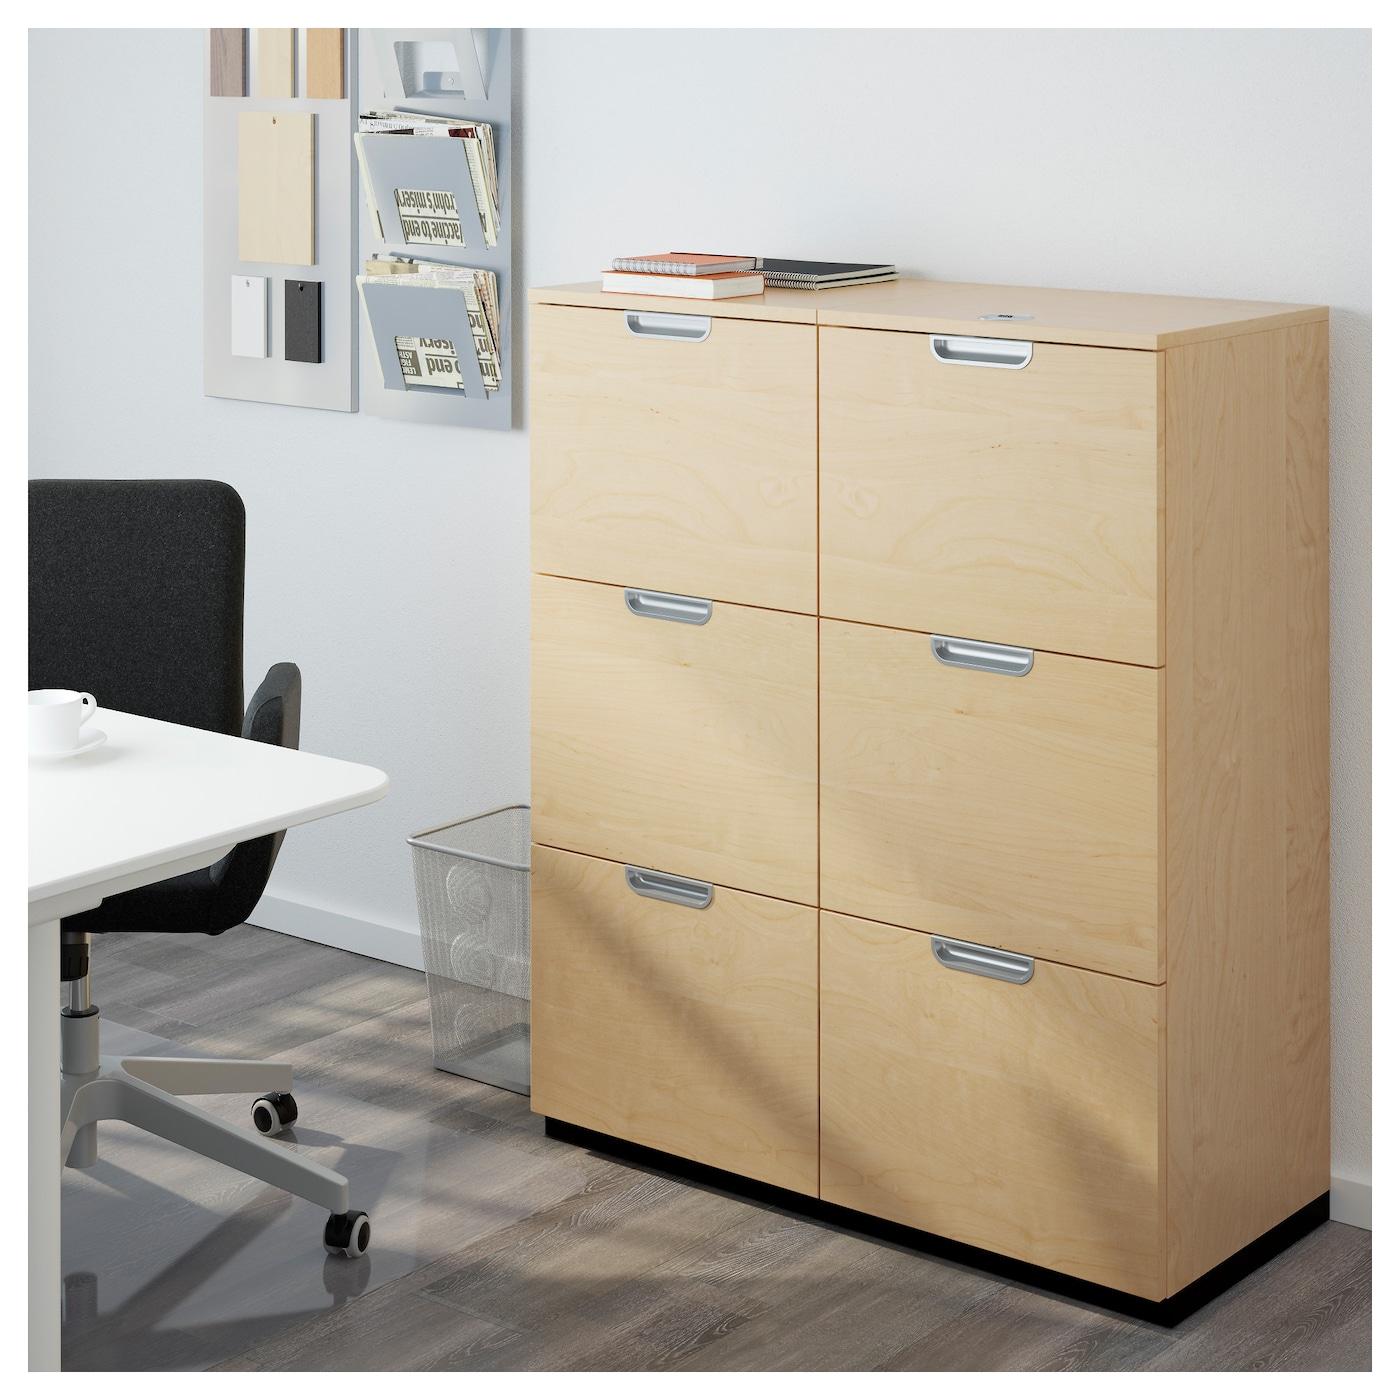 Galant storage combination with filing birch veneer for Birch veneer kitchen cabinets